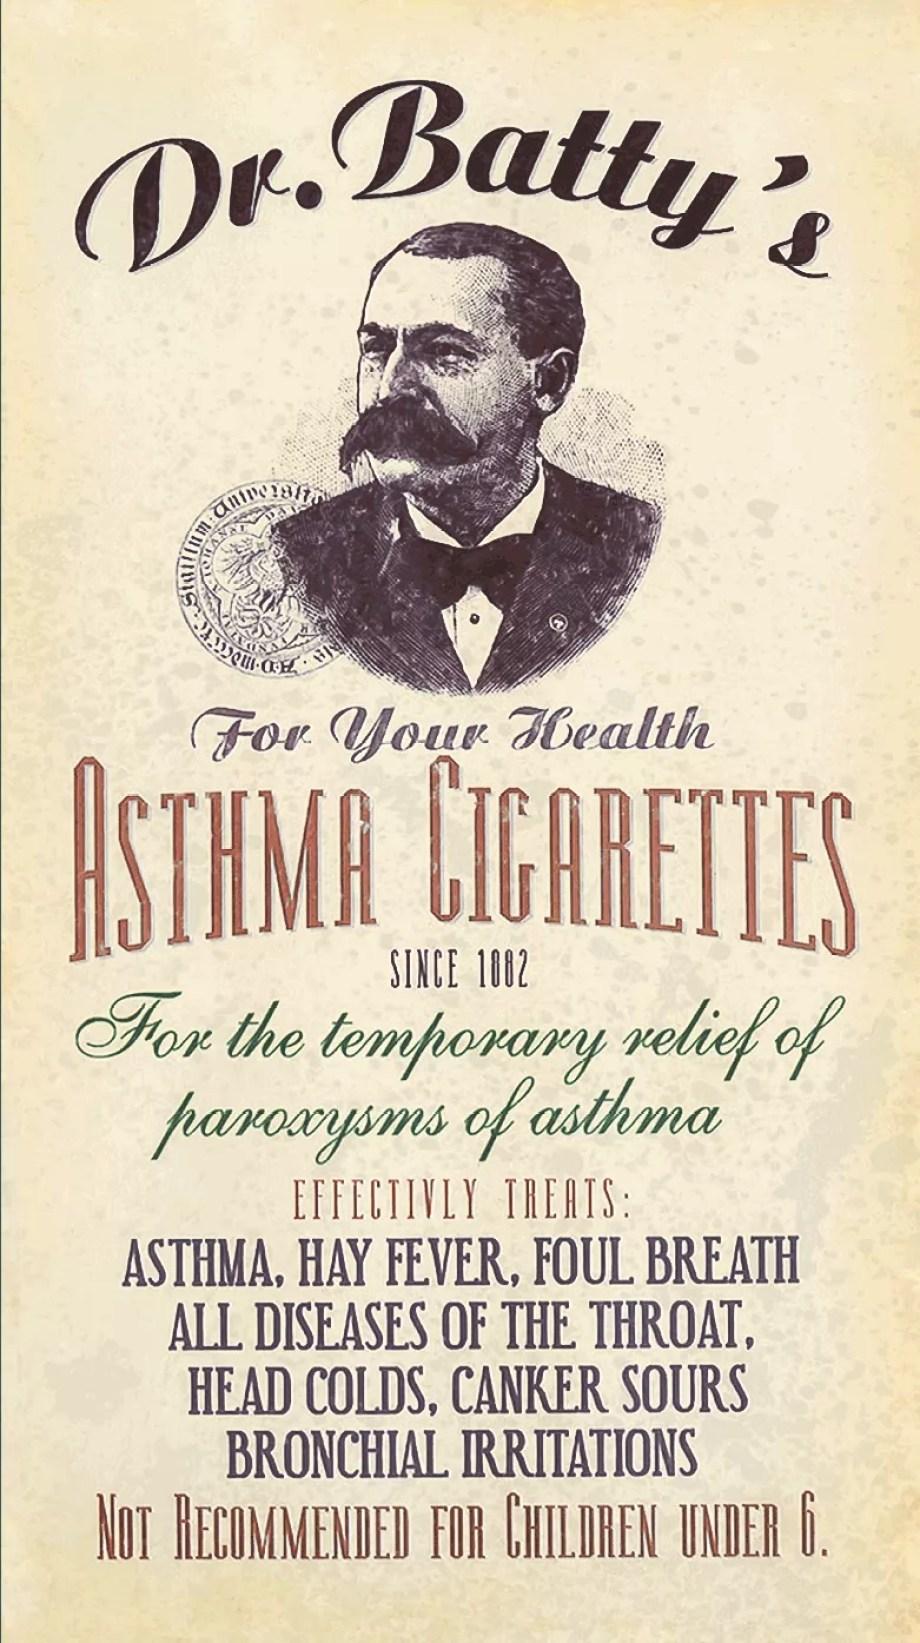 Cocaine, Laudanum, Opium, Methedrine and Asthma Cigarettes naive vintage ads